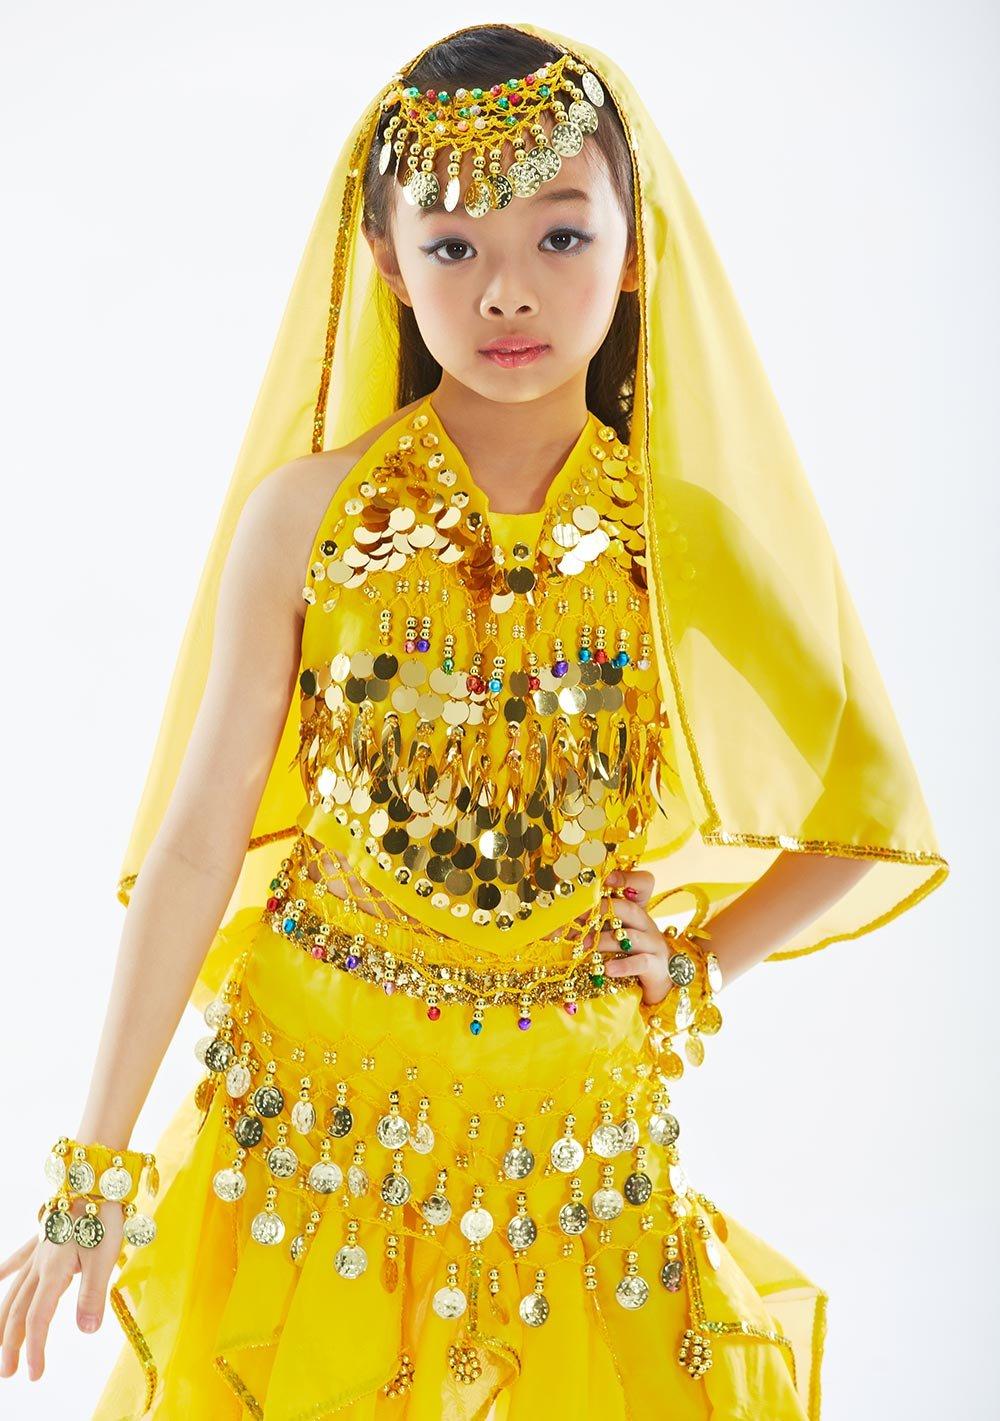 BELLYQUEEN Robe Danse Ventre Fille Costume Classique Danse Oriental Belly  Dance 7 Pcs Top+Sarouel Agrandir l image cf630c092da